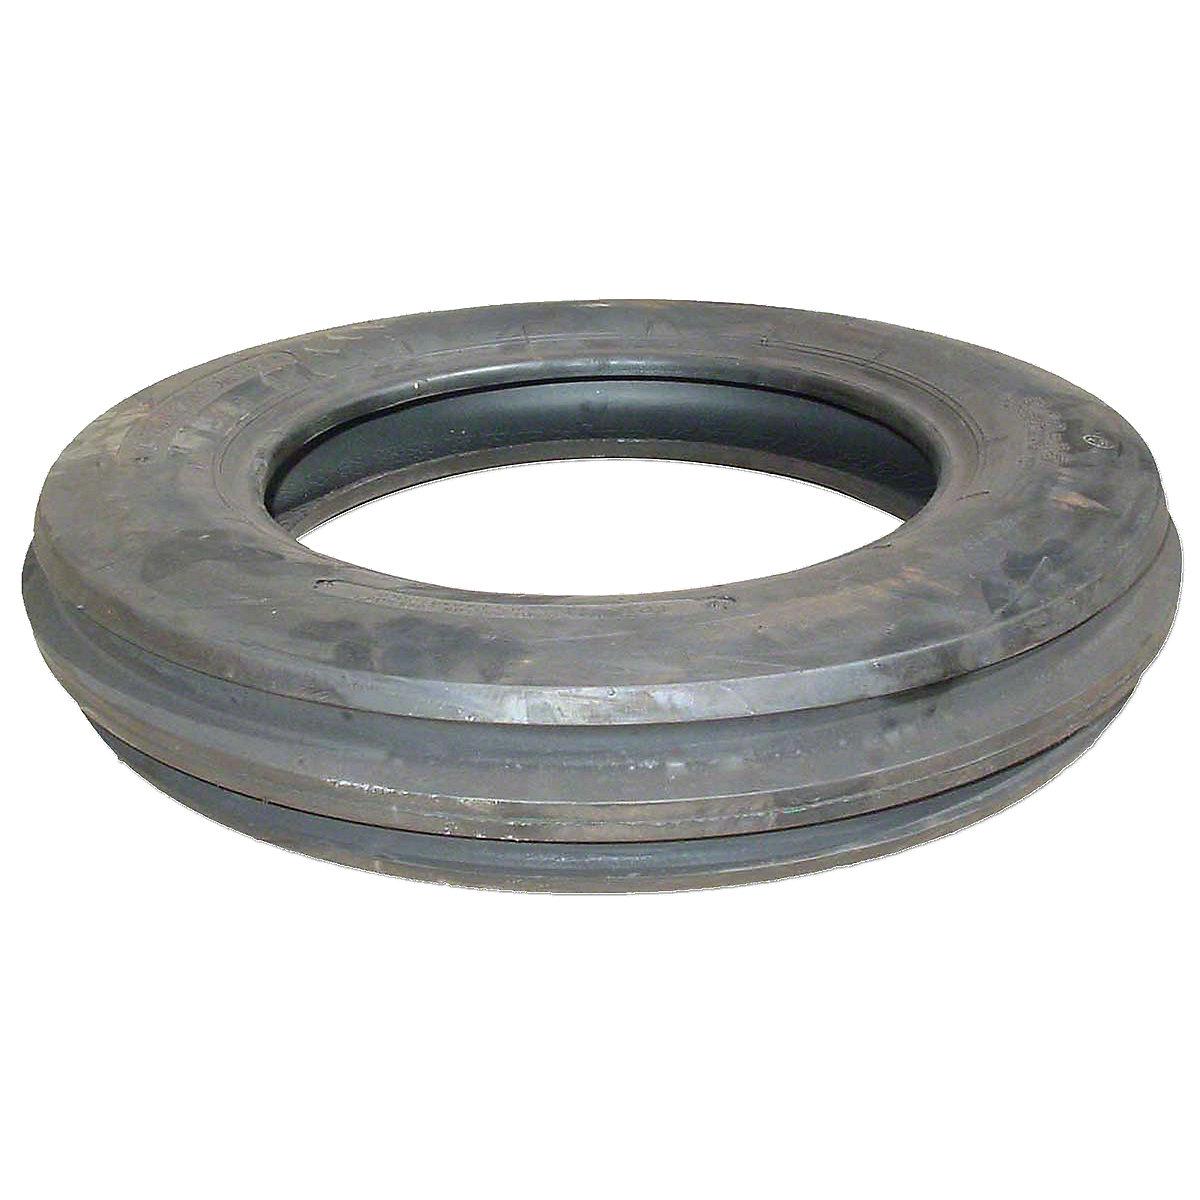 5.00X15 Triple Rib 6 Ply Tire For Allis Chalmers Tractors